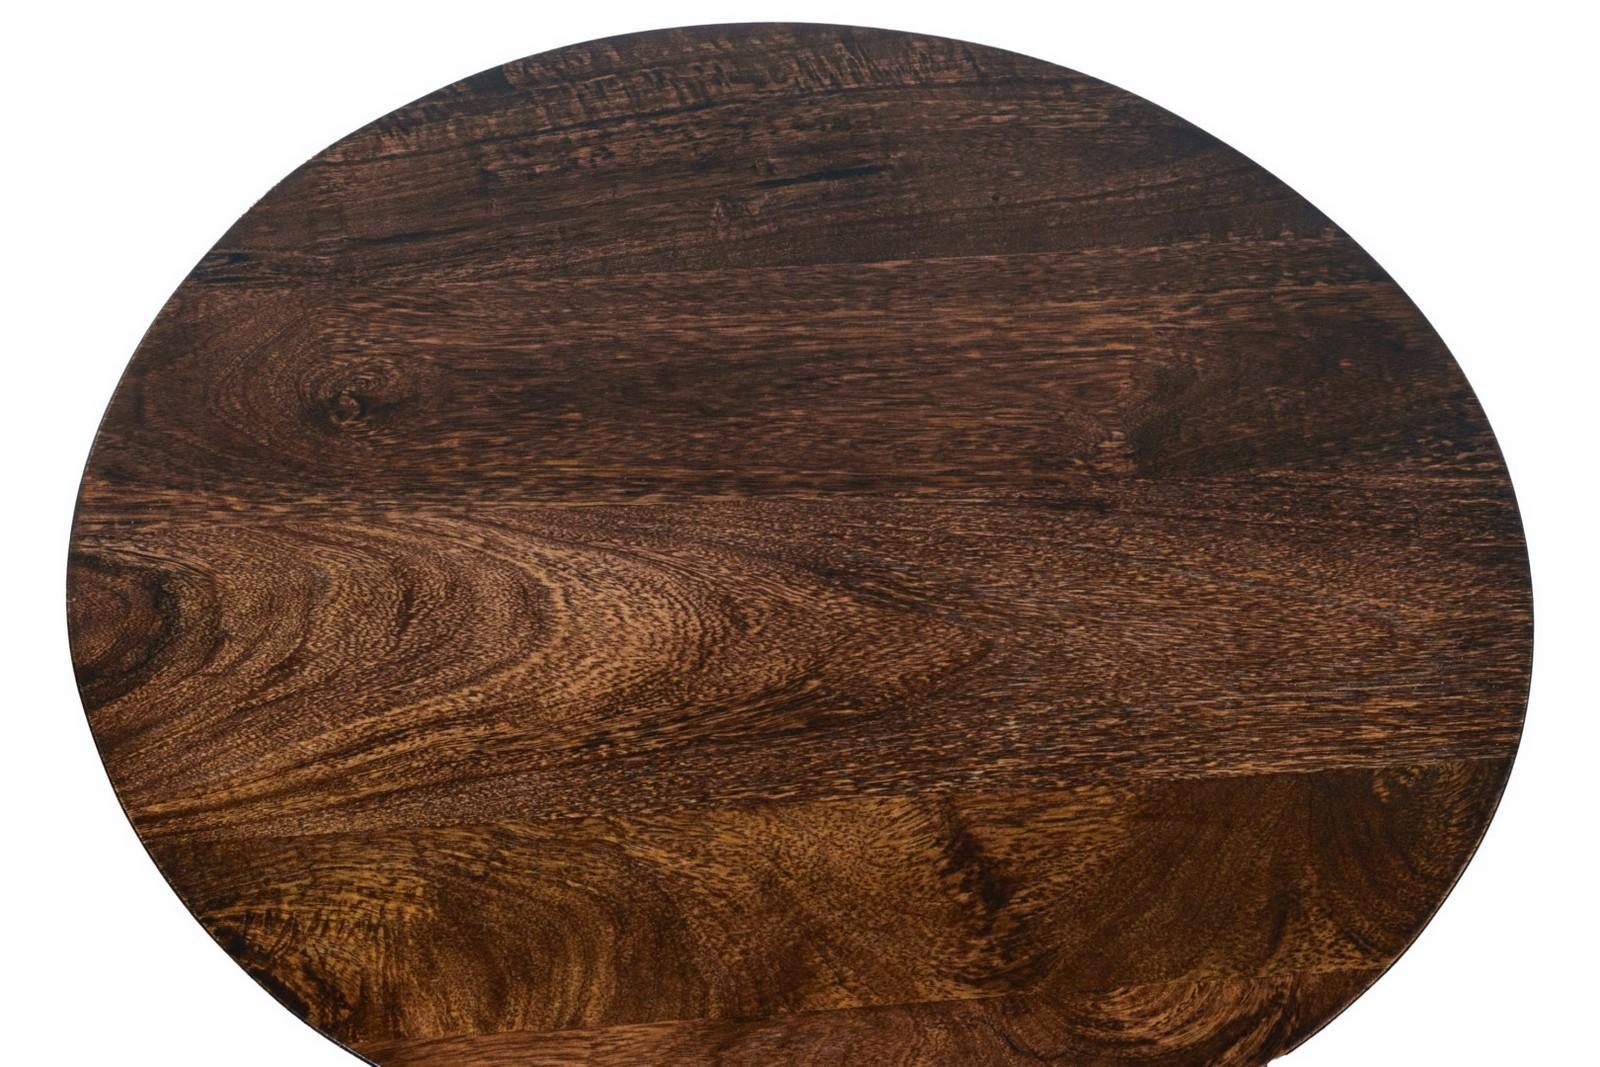 Fraser Wooden Side Table For Living Room